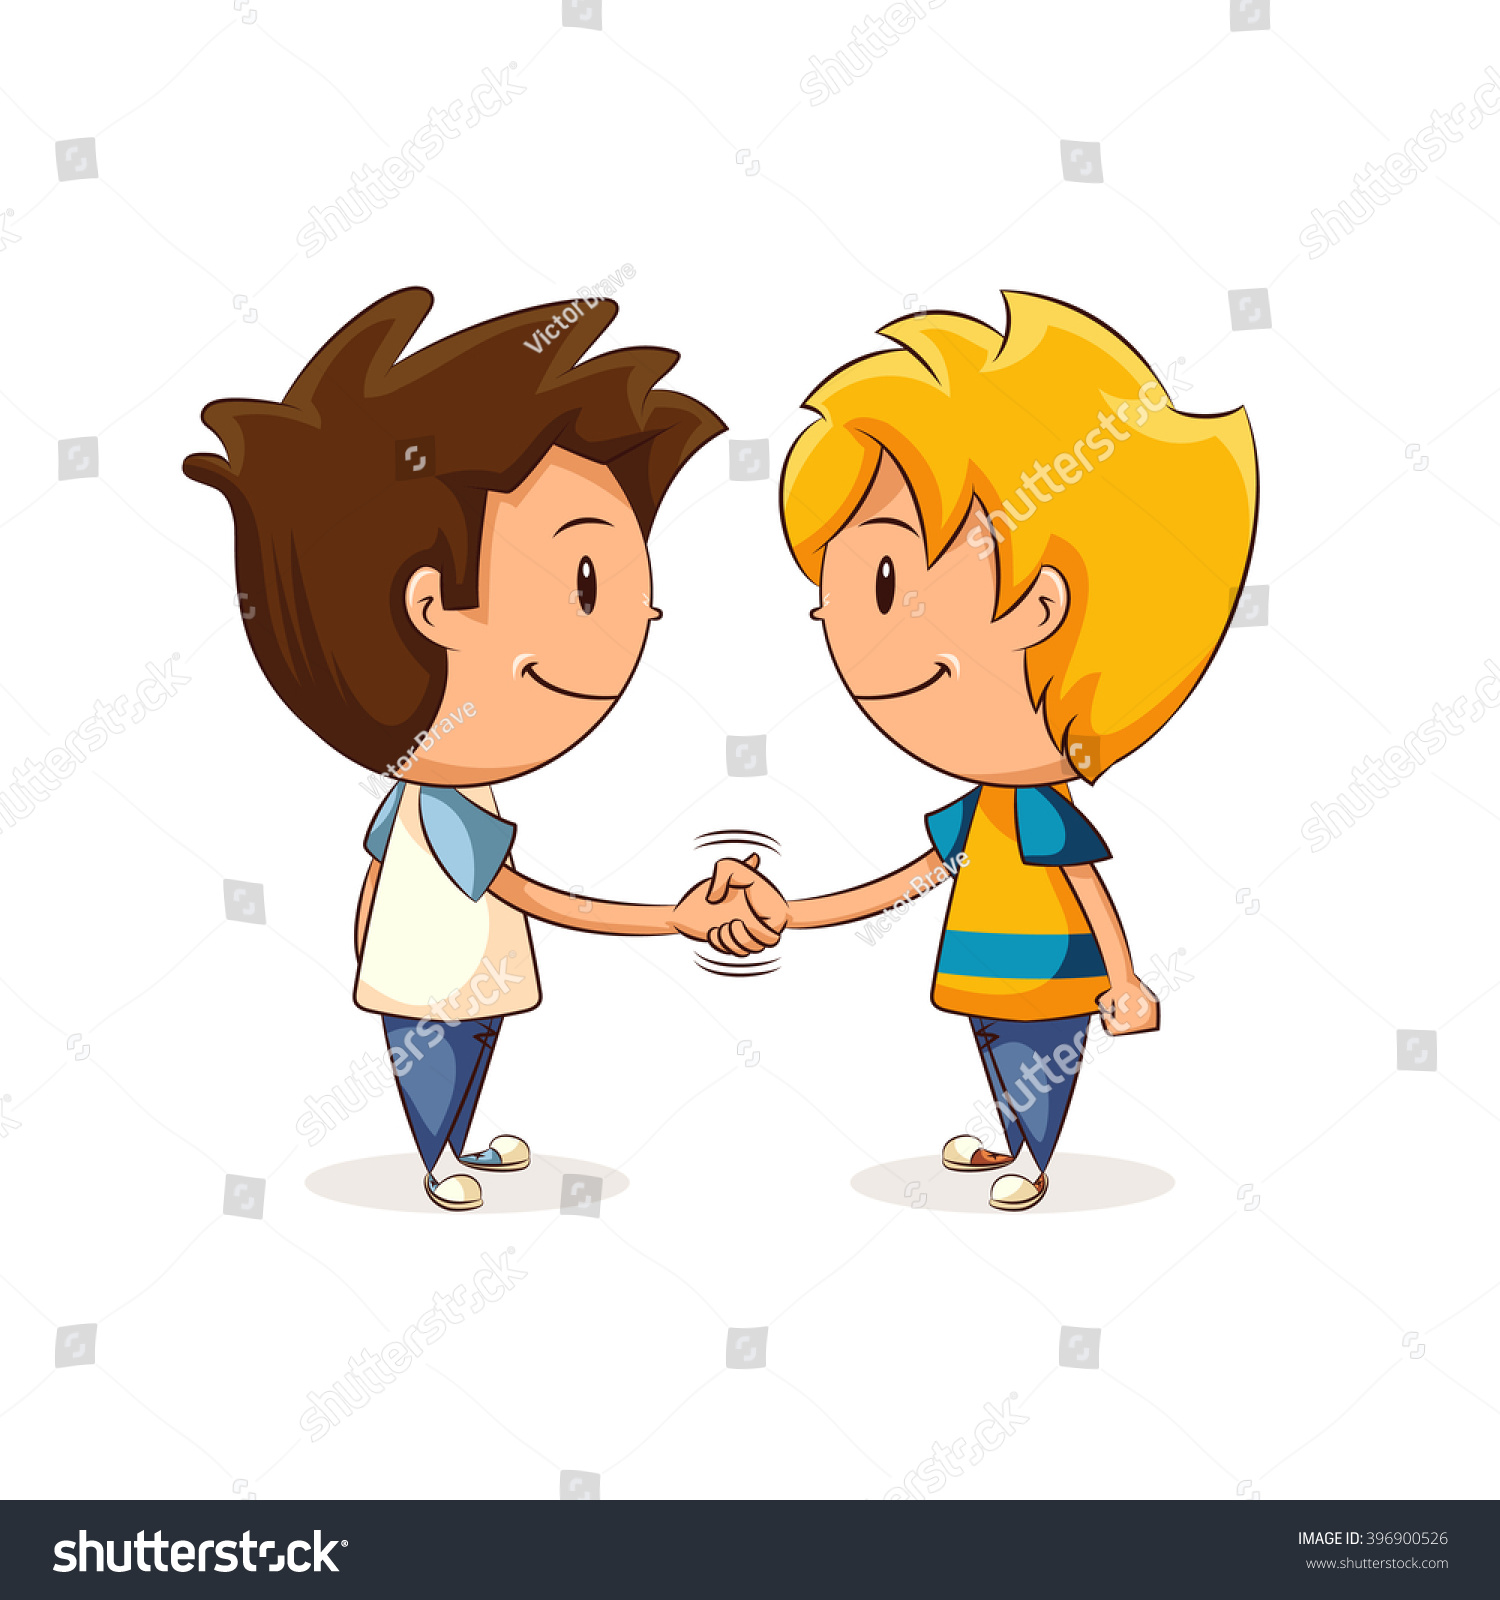 children handshake clipart - photo #4